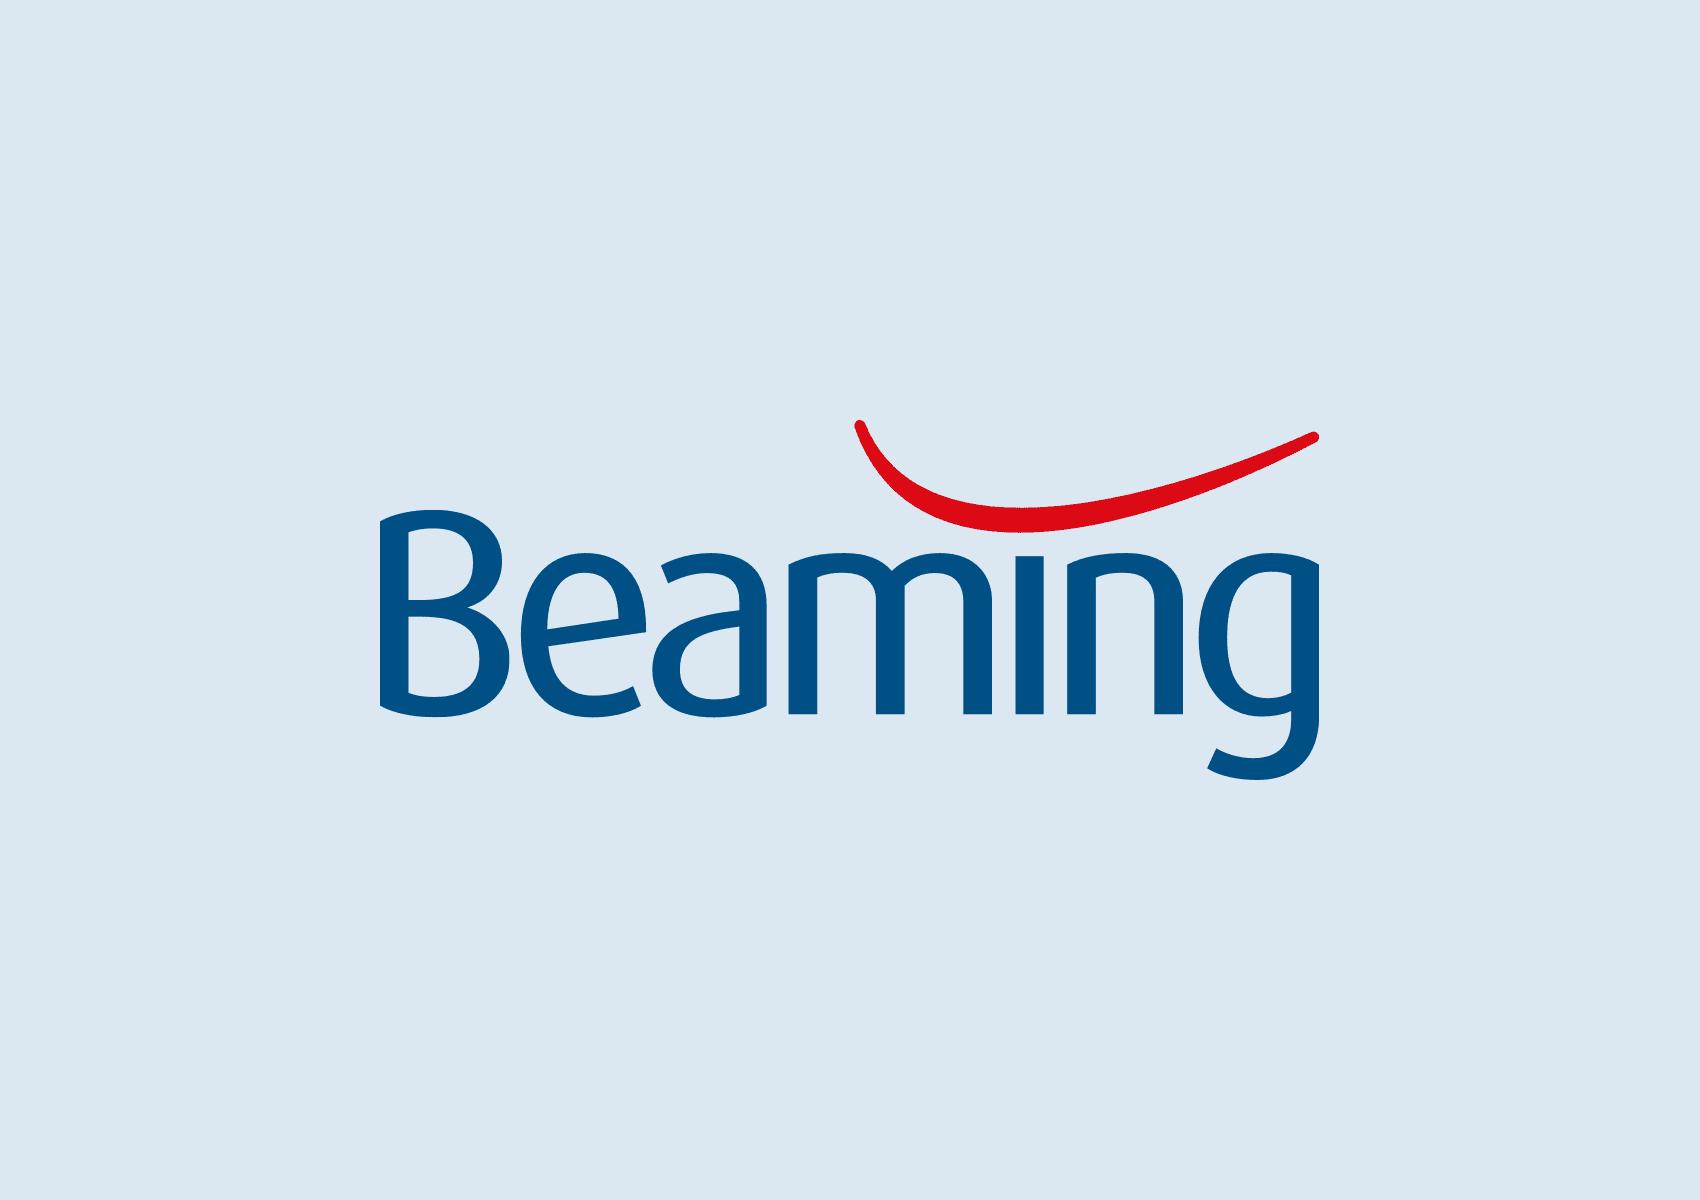 Beaming brand identity